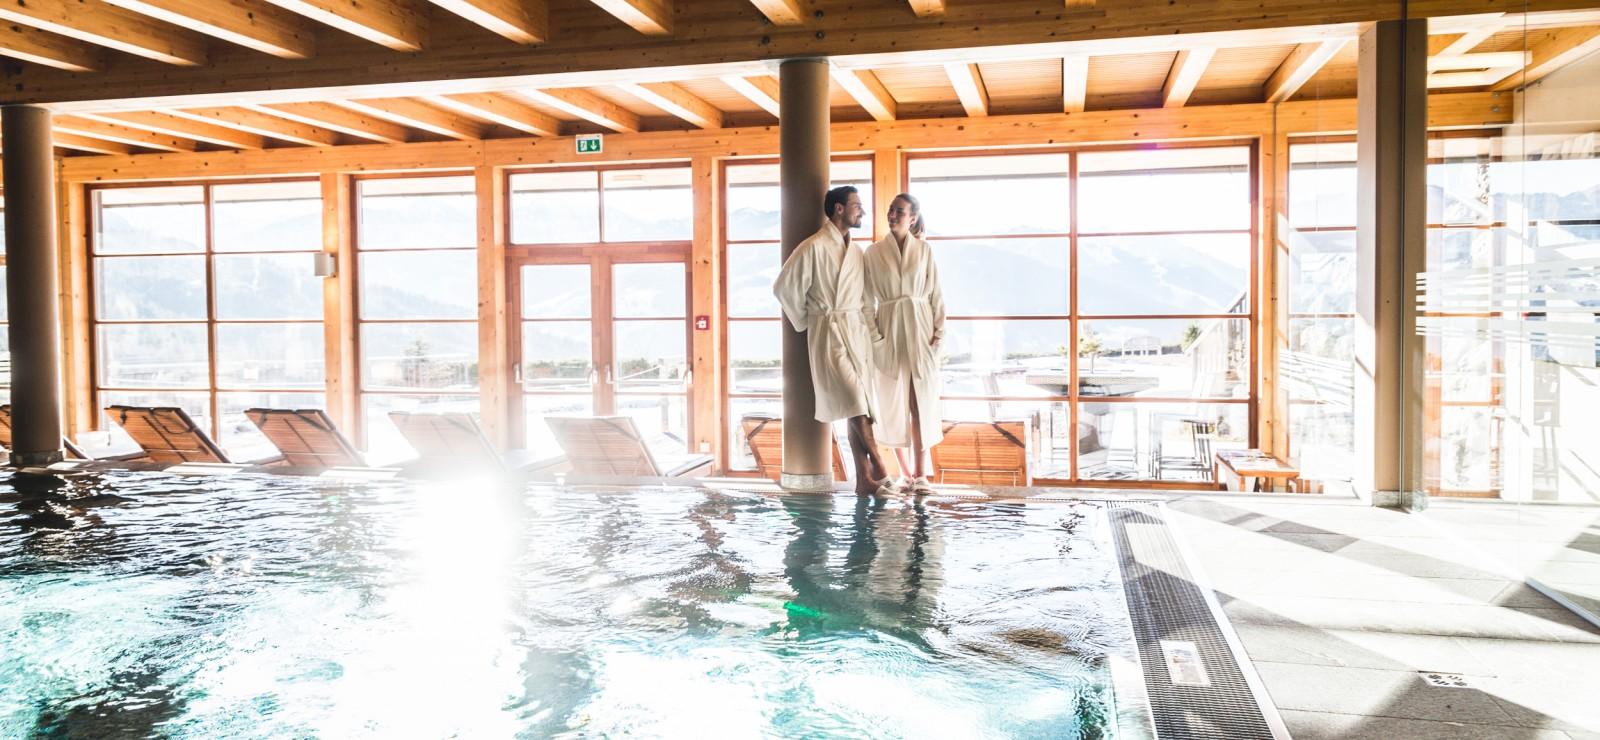 Naturhotel Edelweiss Bilder | Bild 1